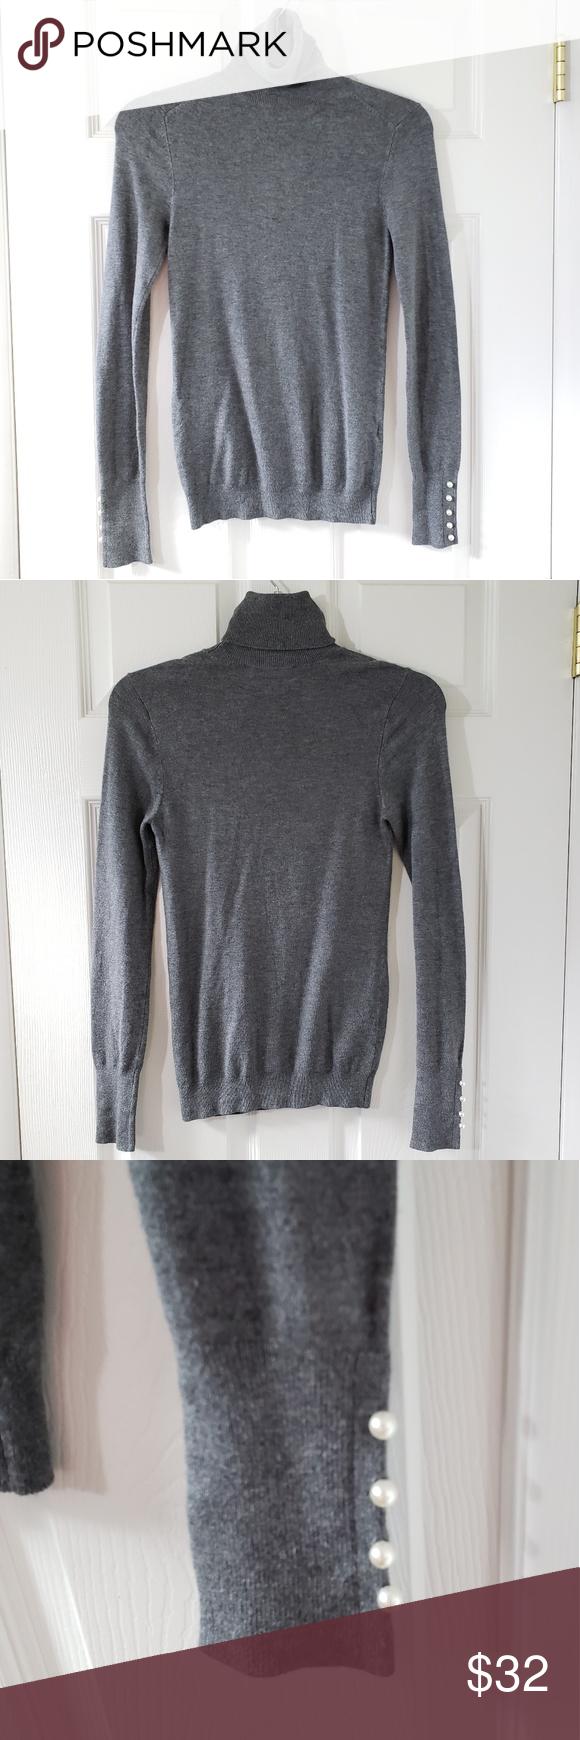 Zara Pearl Button Sleeve Turtleneck Sweater